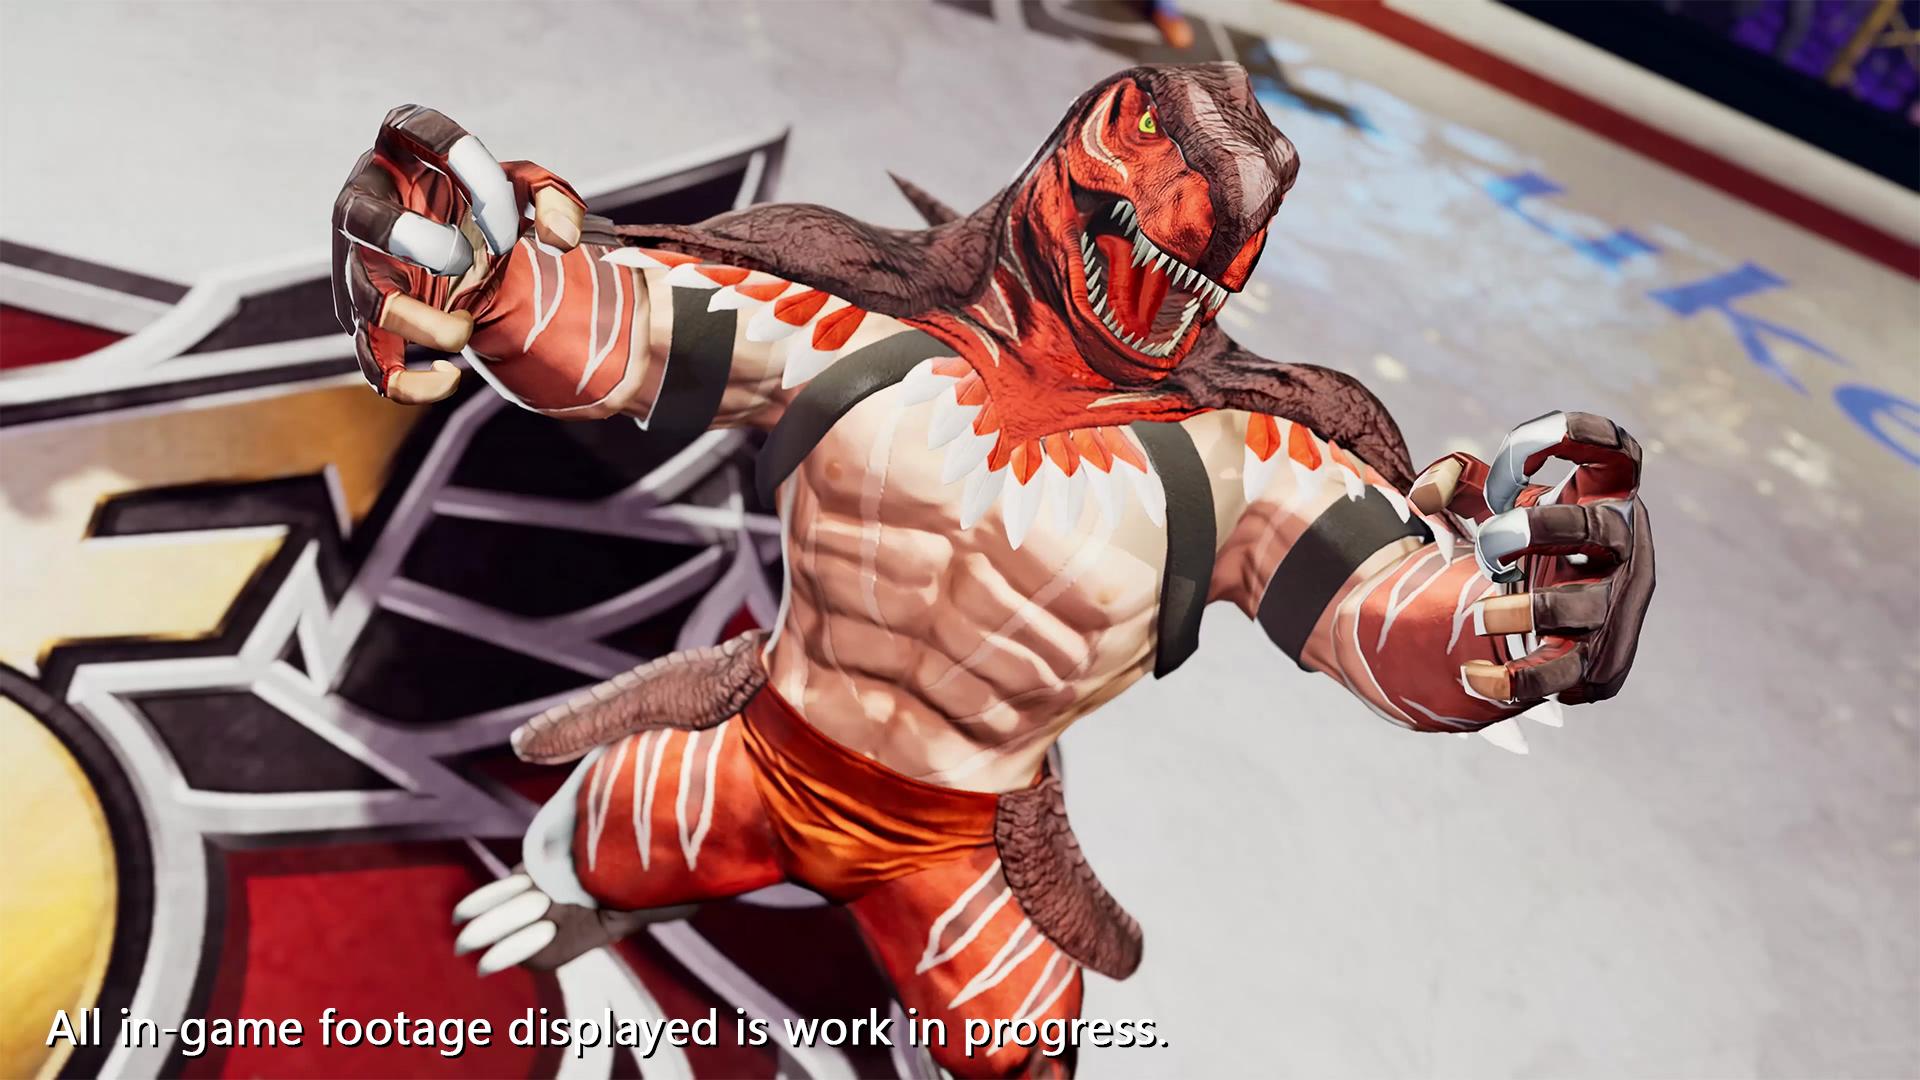 Король Динозавров - The King of Fighters 15